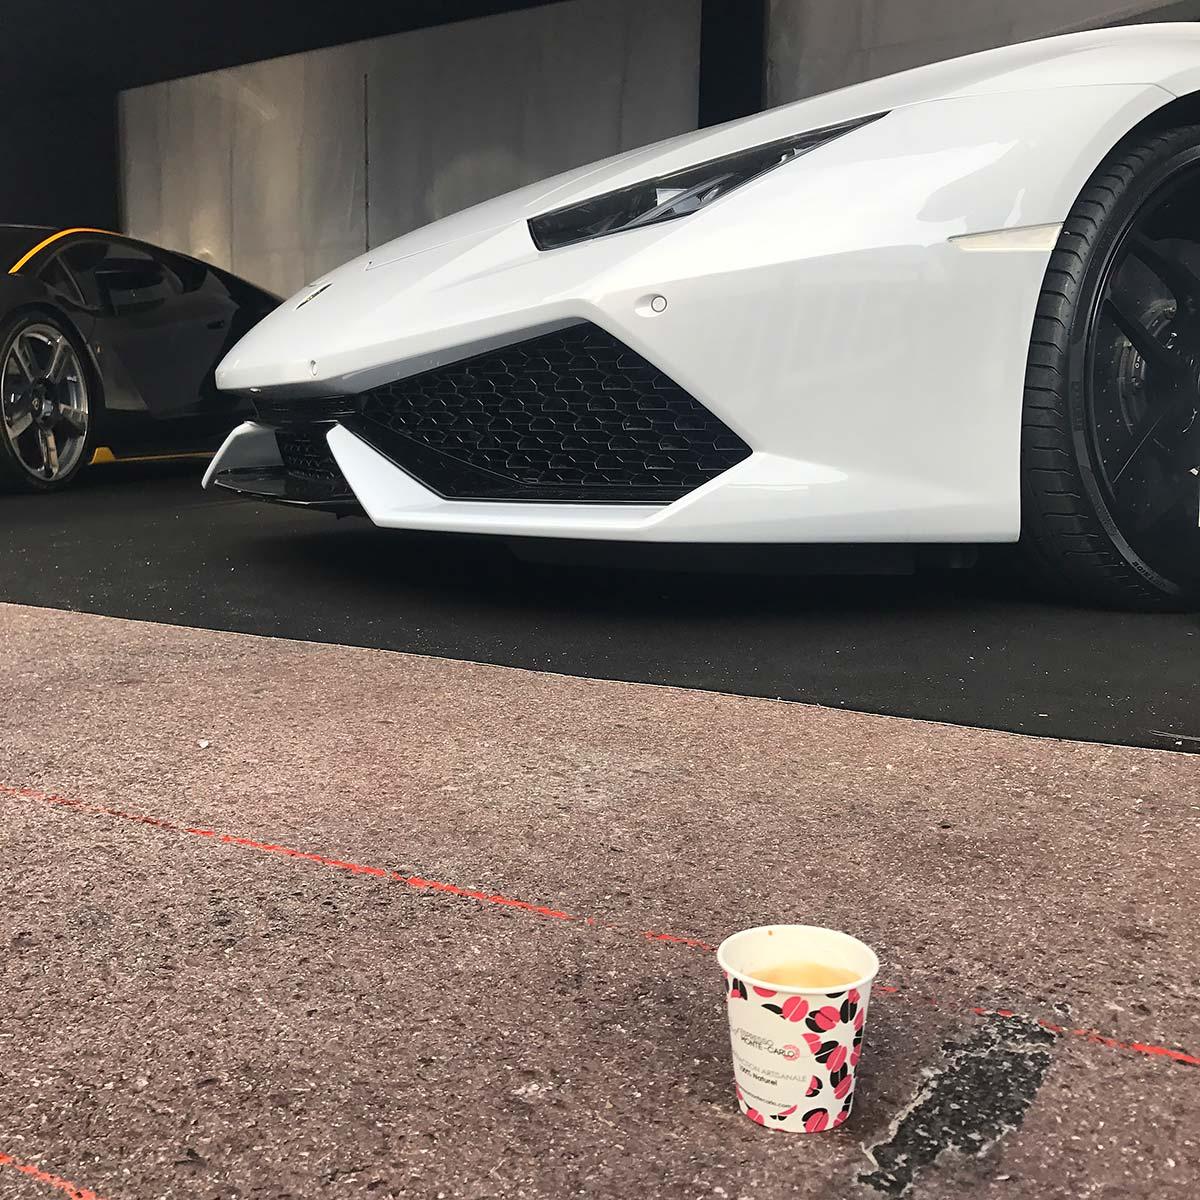 Monaco International Motor Show 2017 - Lamborghini Huracan Spyder